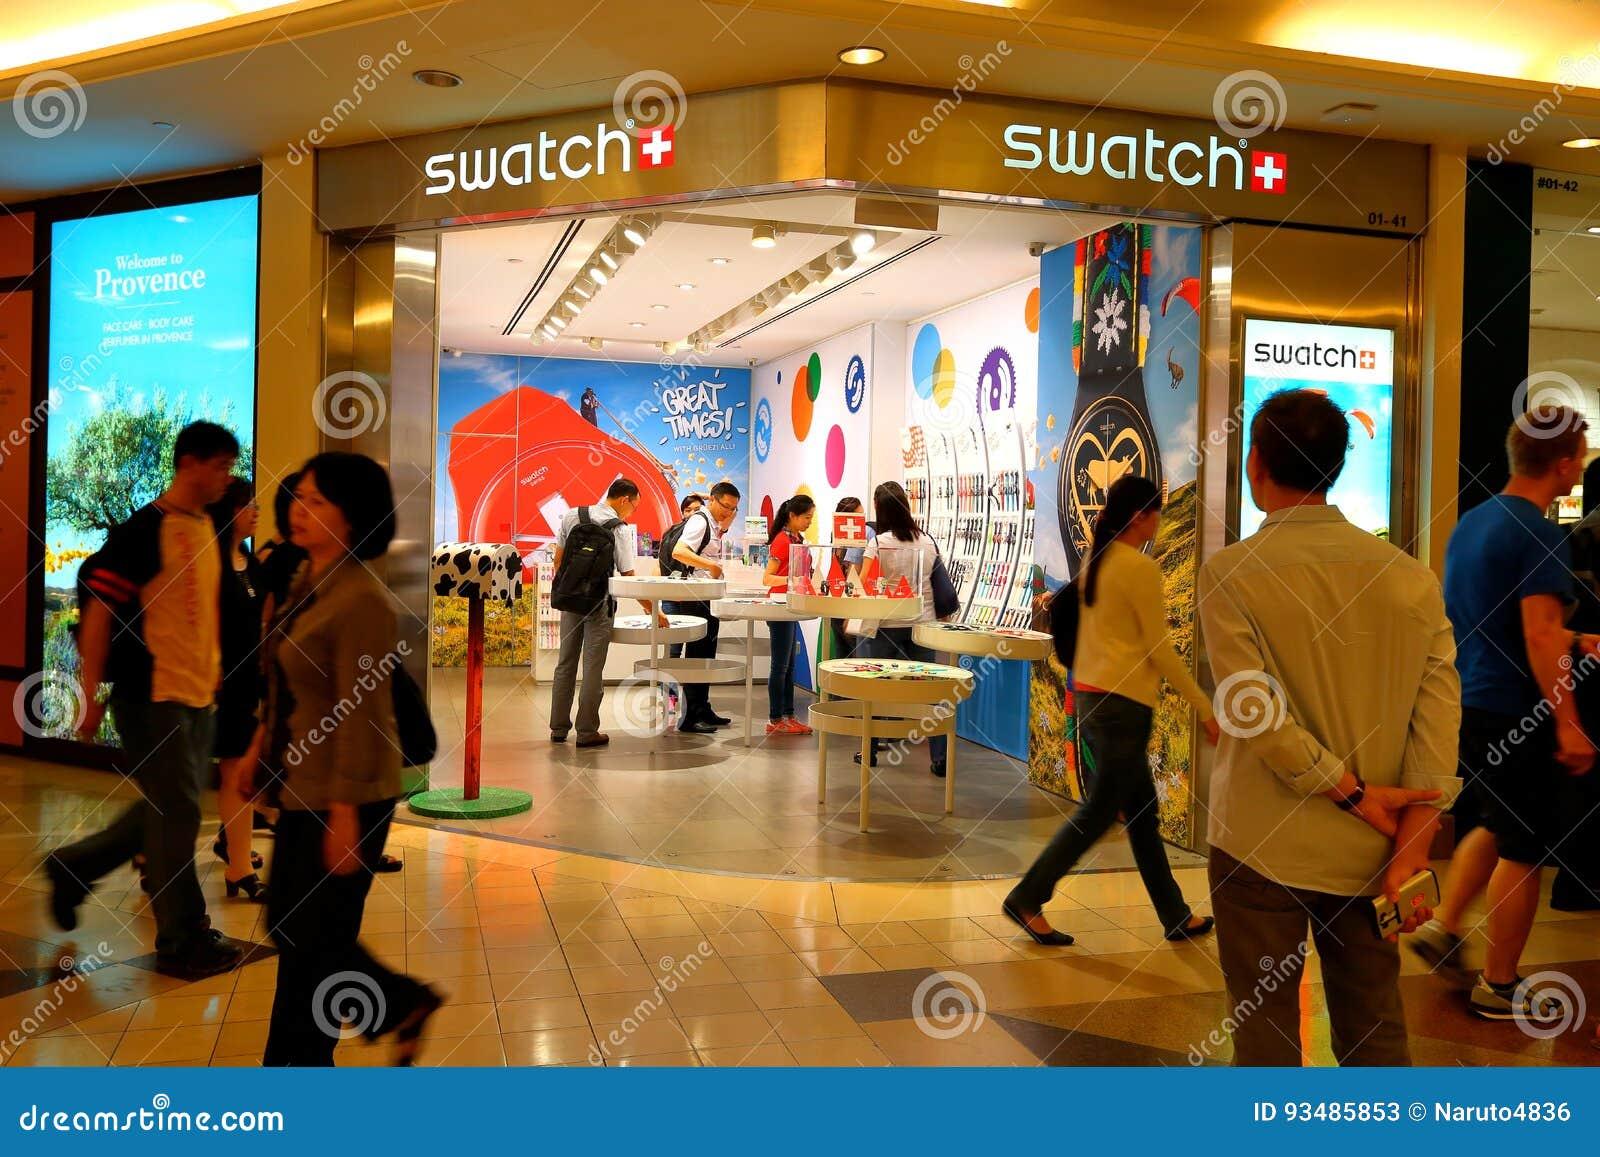 Singapur: Swatch